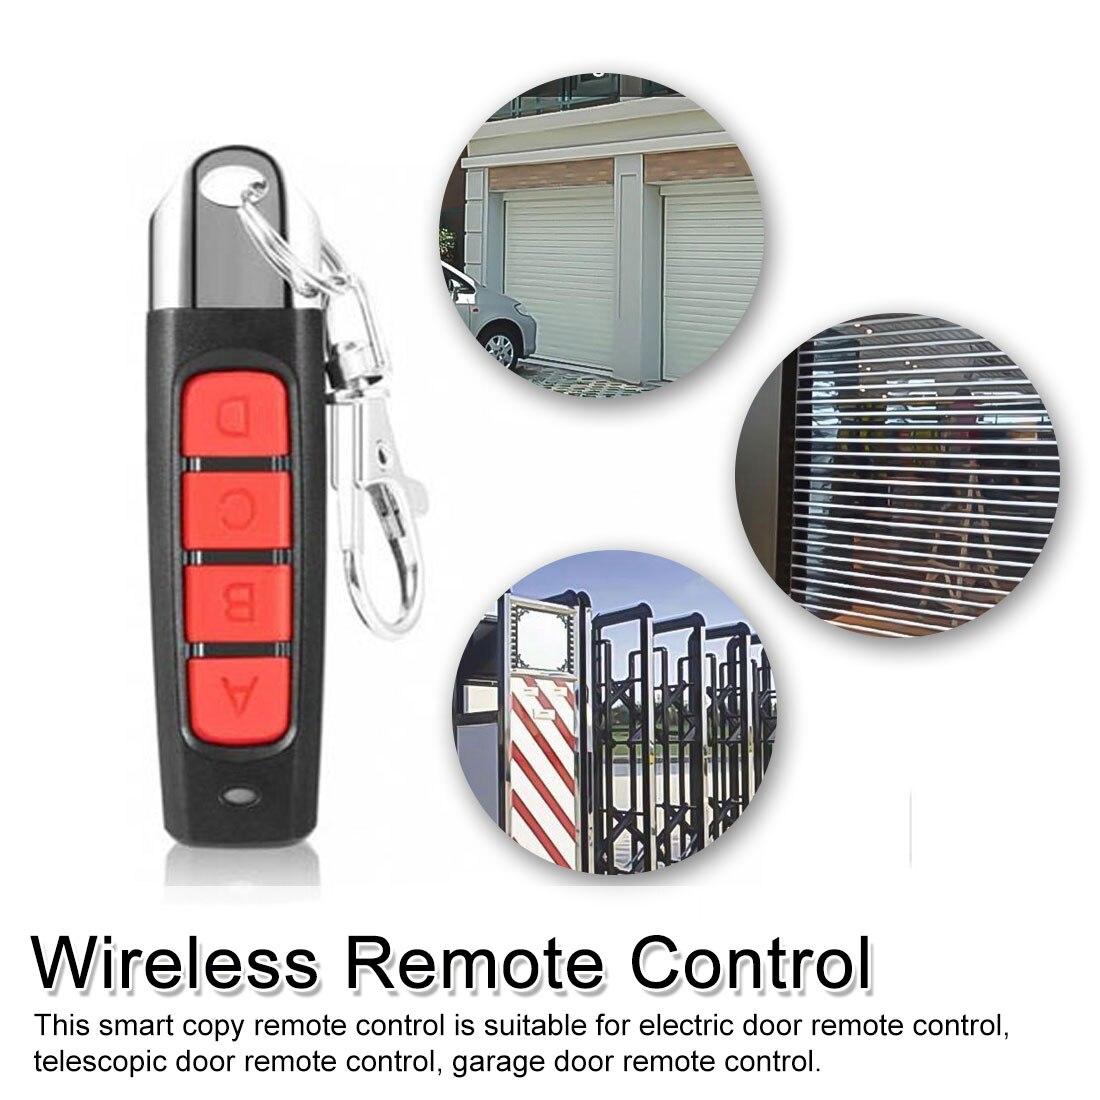 Universal Wireless Remote Control 433Mhz Receiver Module RF Transmitter Electric Cloning Gate Garage Pan Remote Control